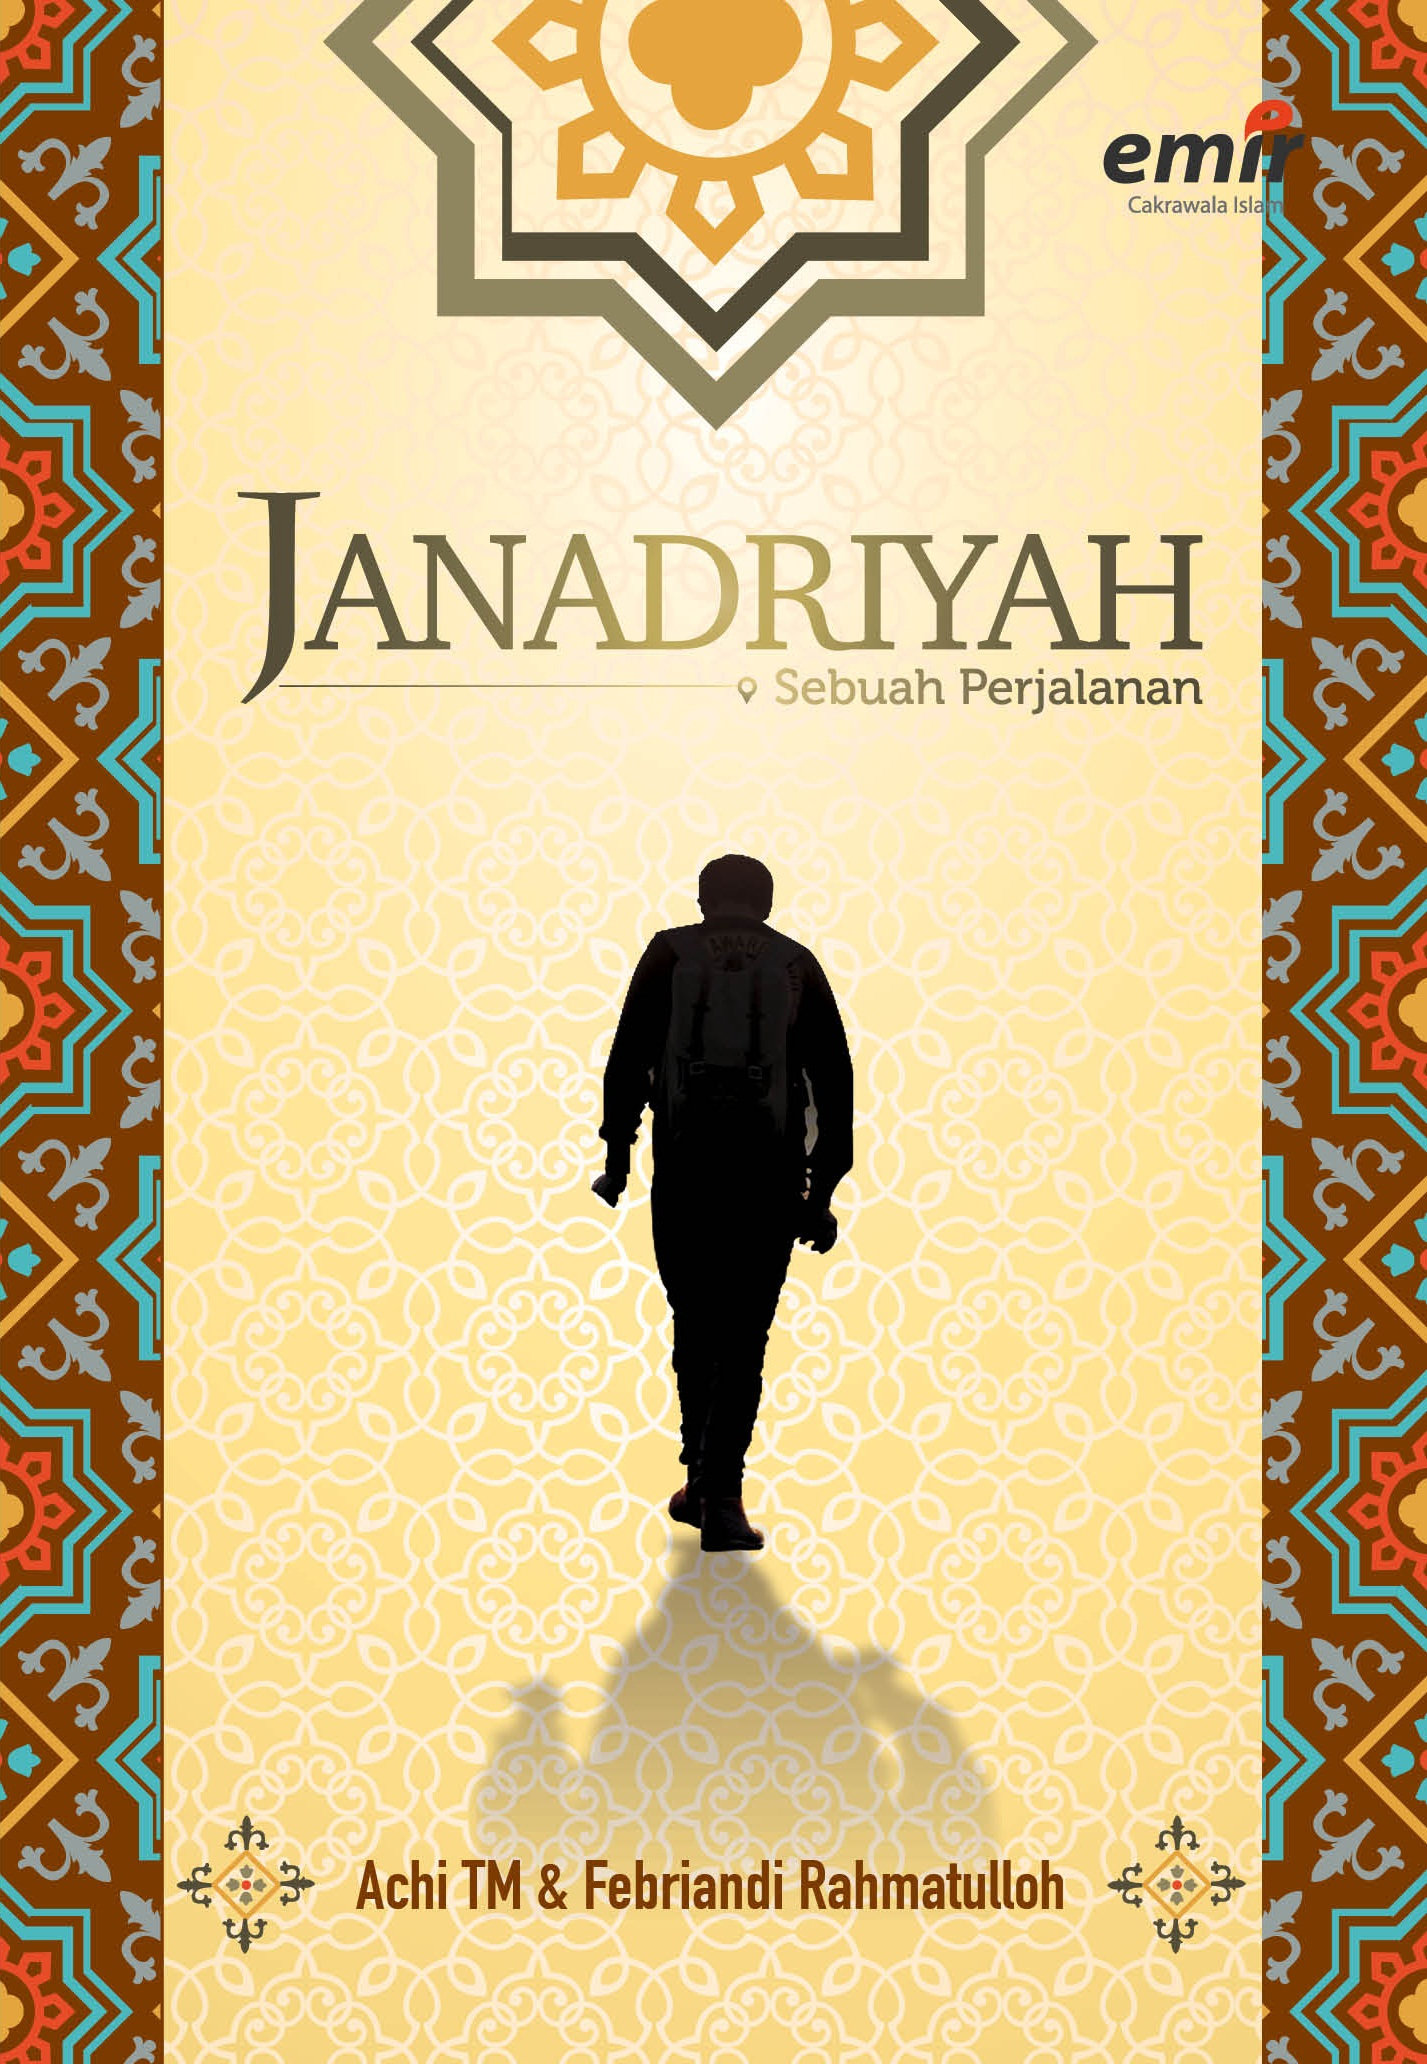 Janadriyah (Sebuah Perjalanan)